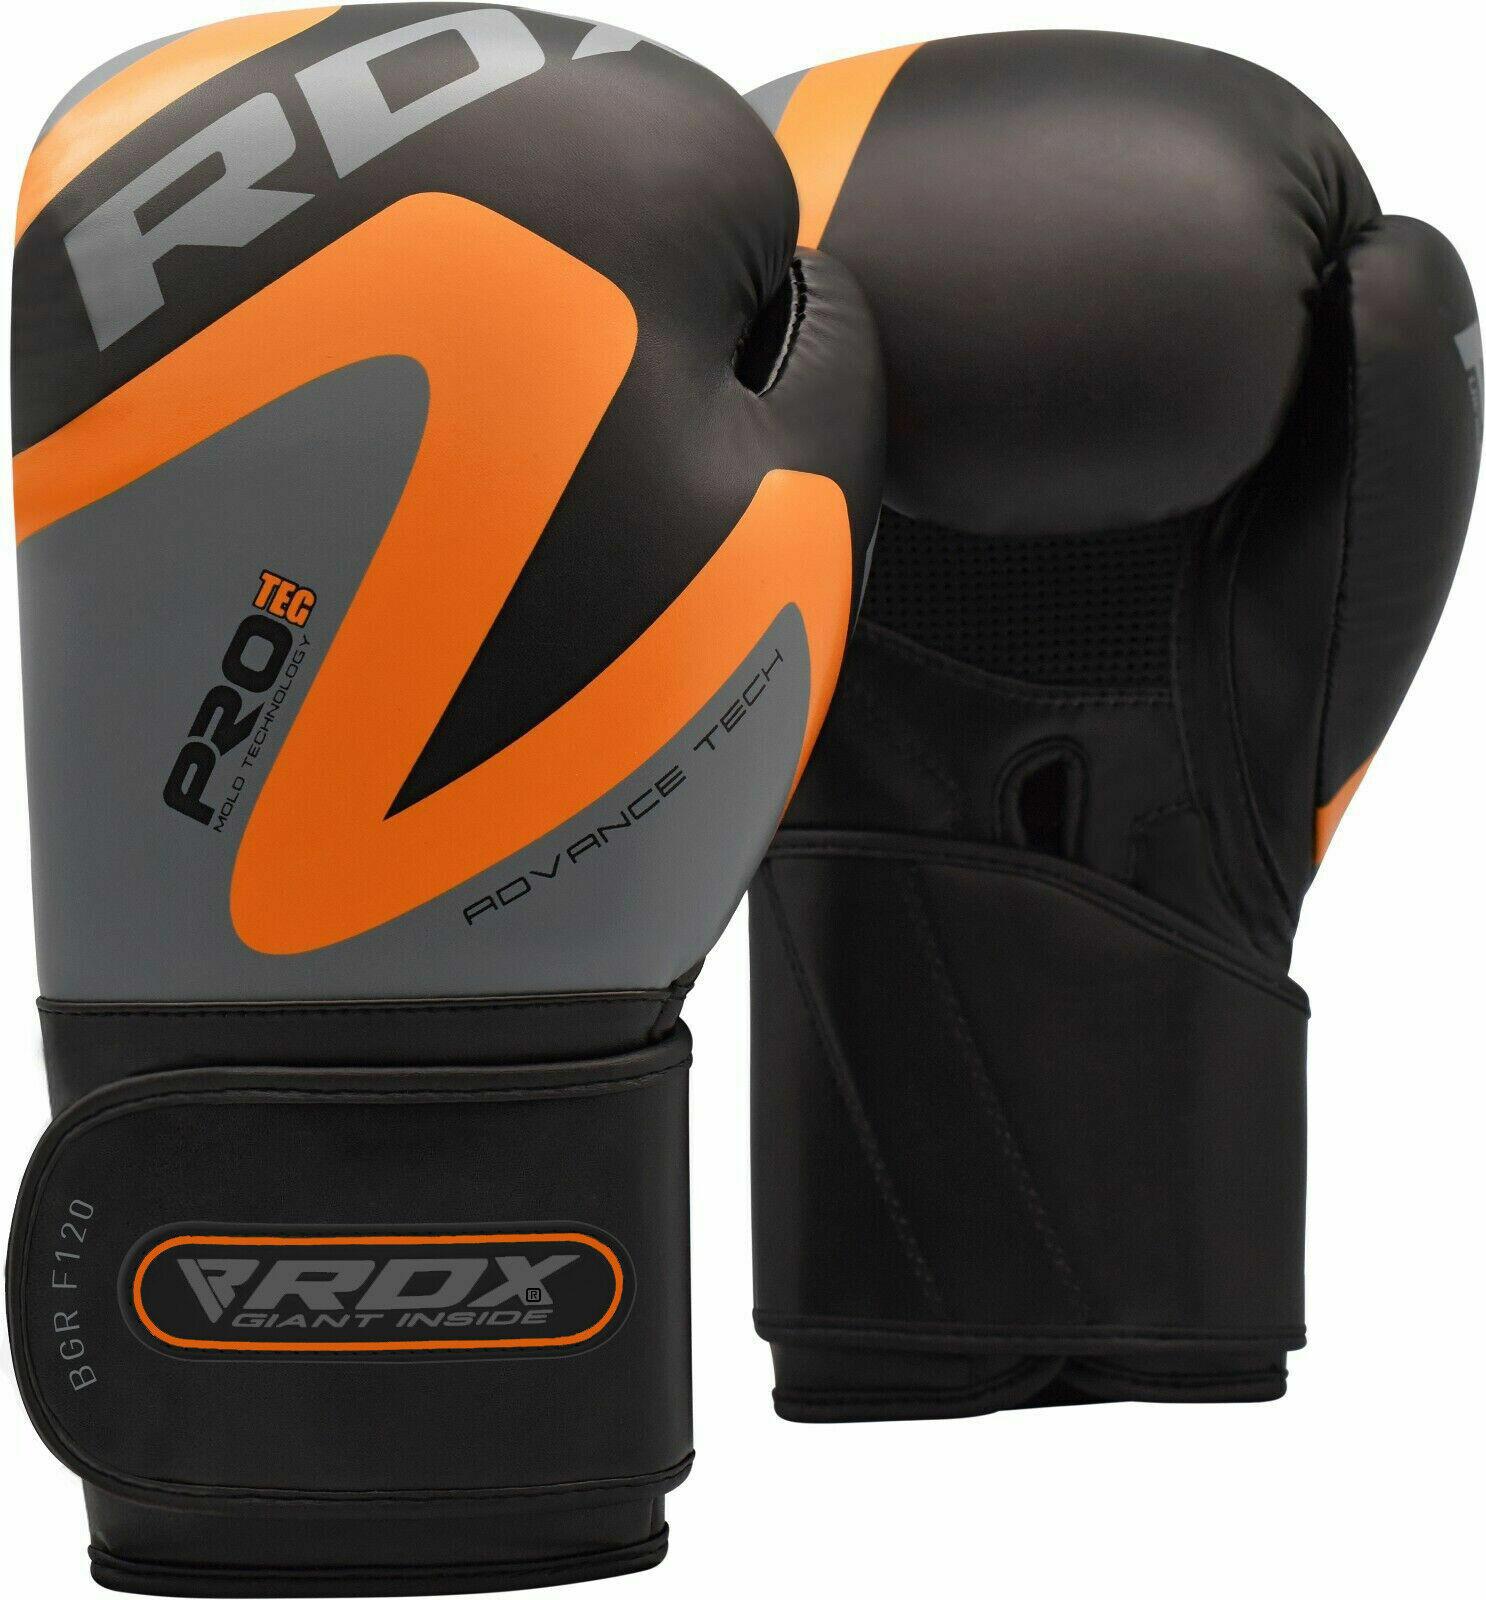 RDX 12 onzas de guantes de boxeo, boxeo tailandés, f12 os.